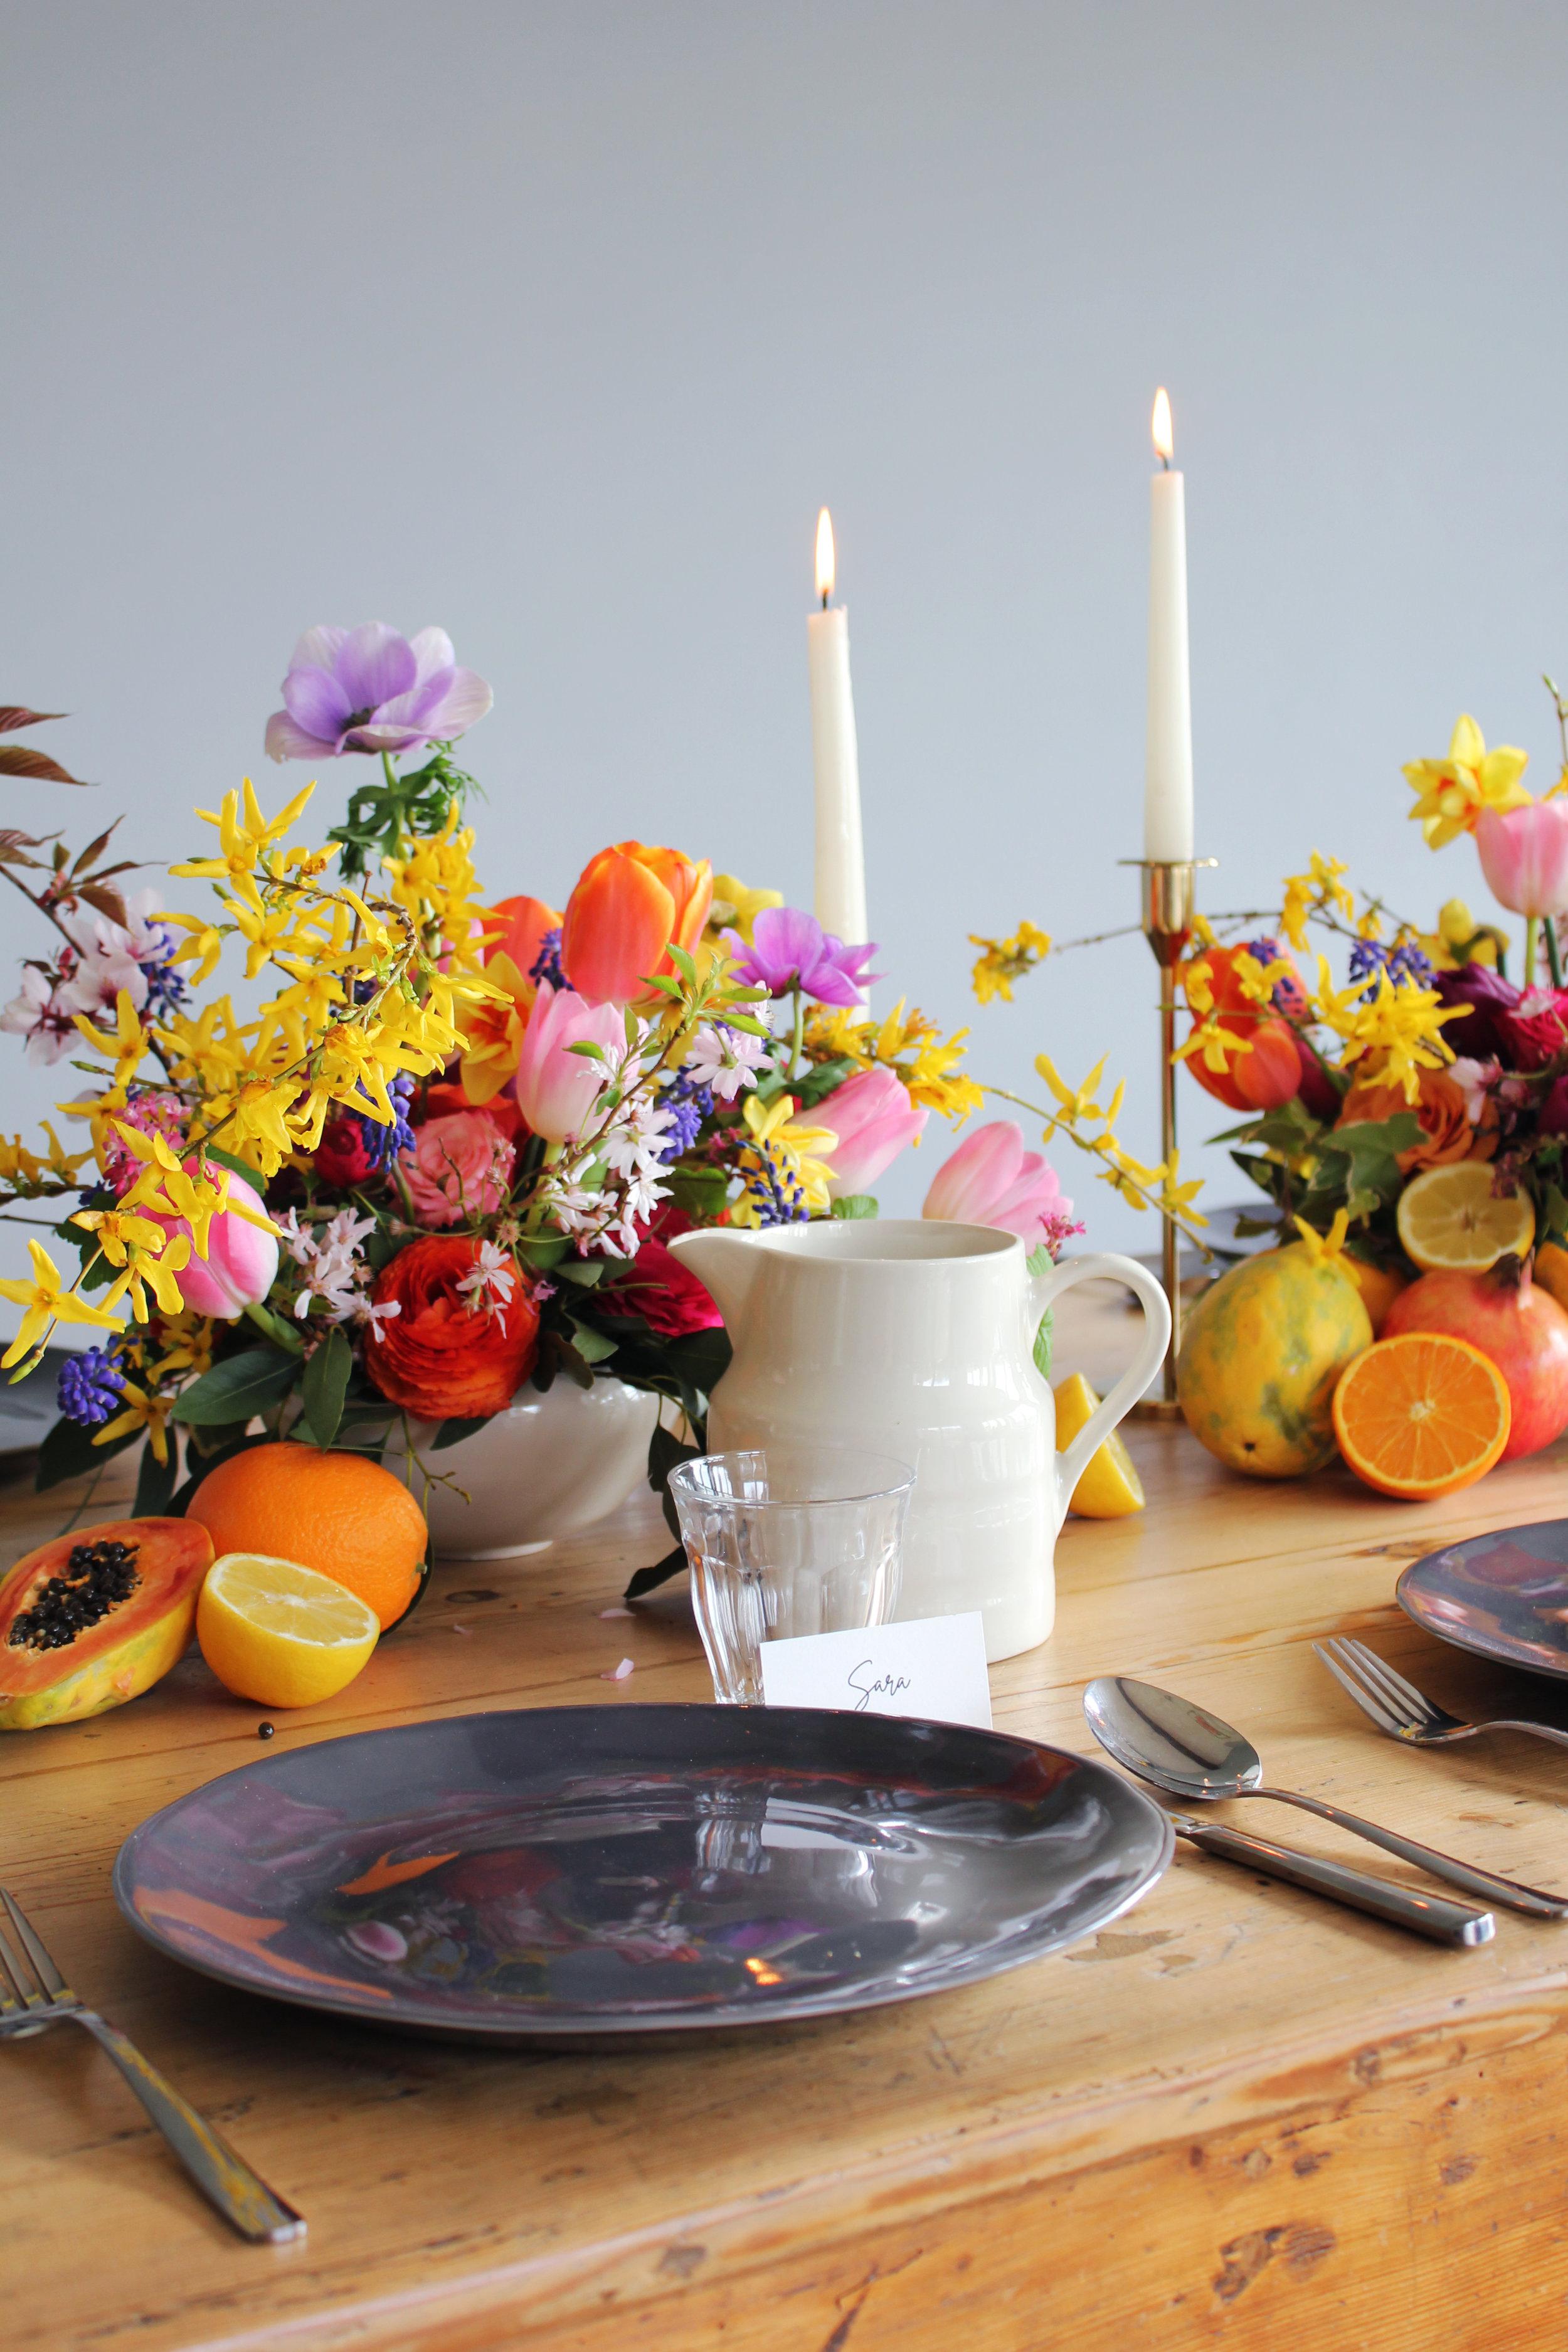 Callie-Pettigrew-Fruity-Florals-15.jpg